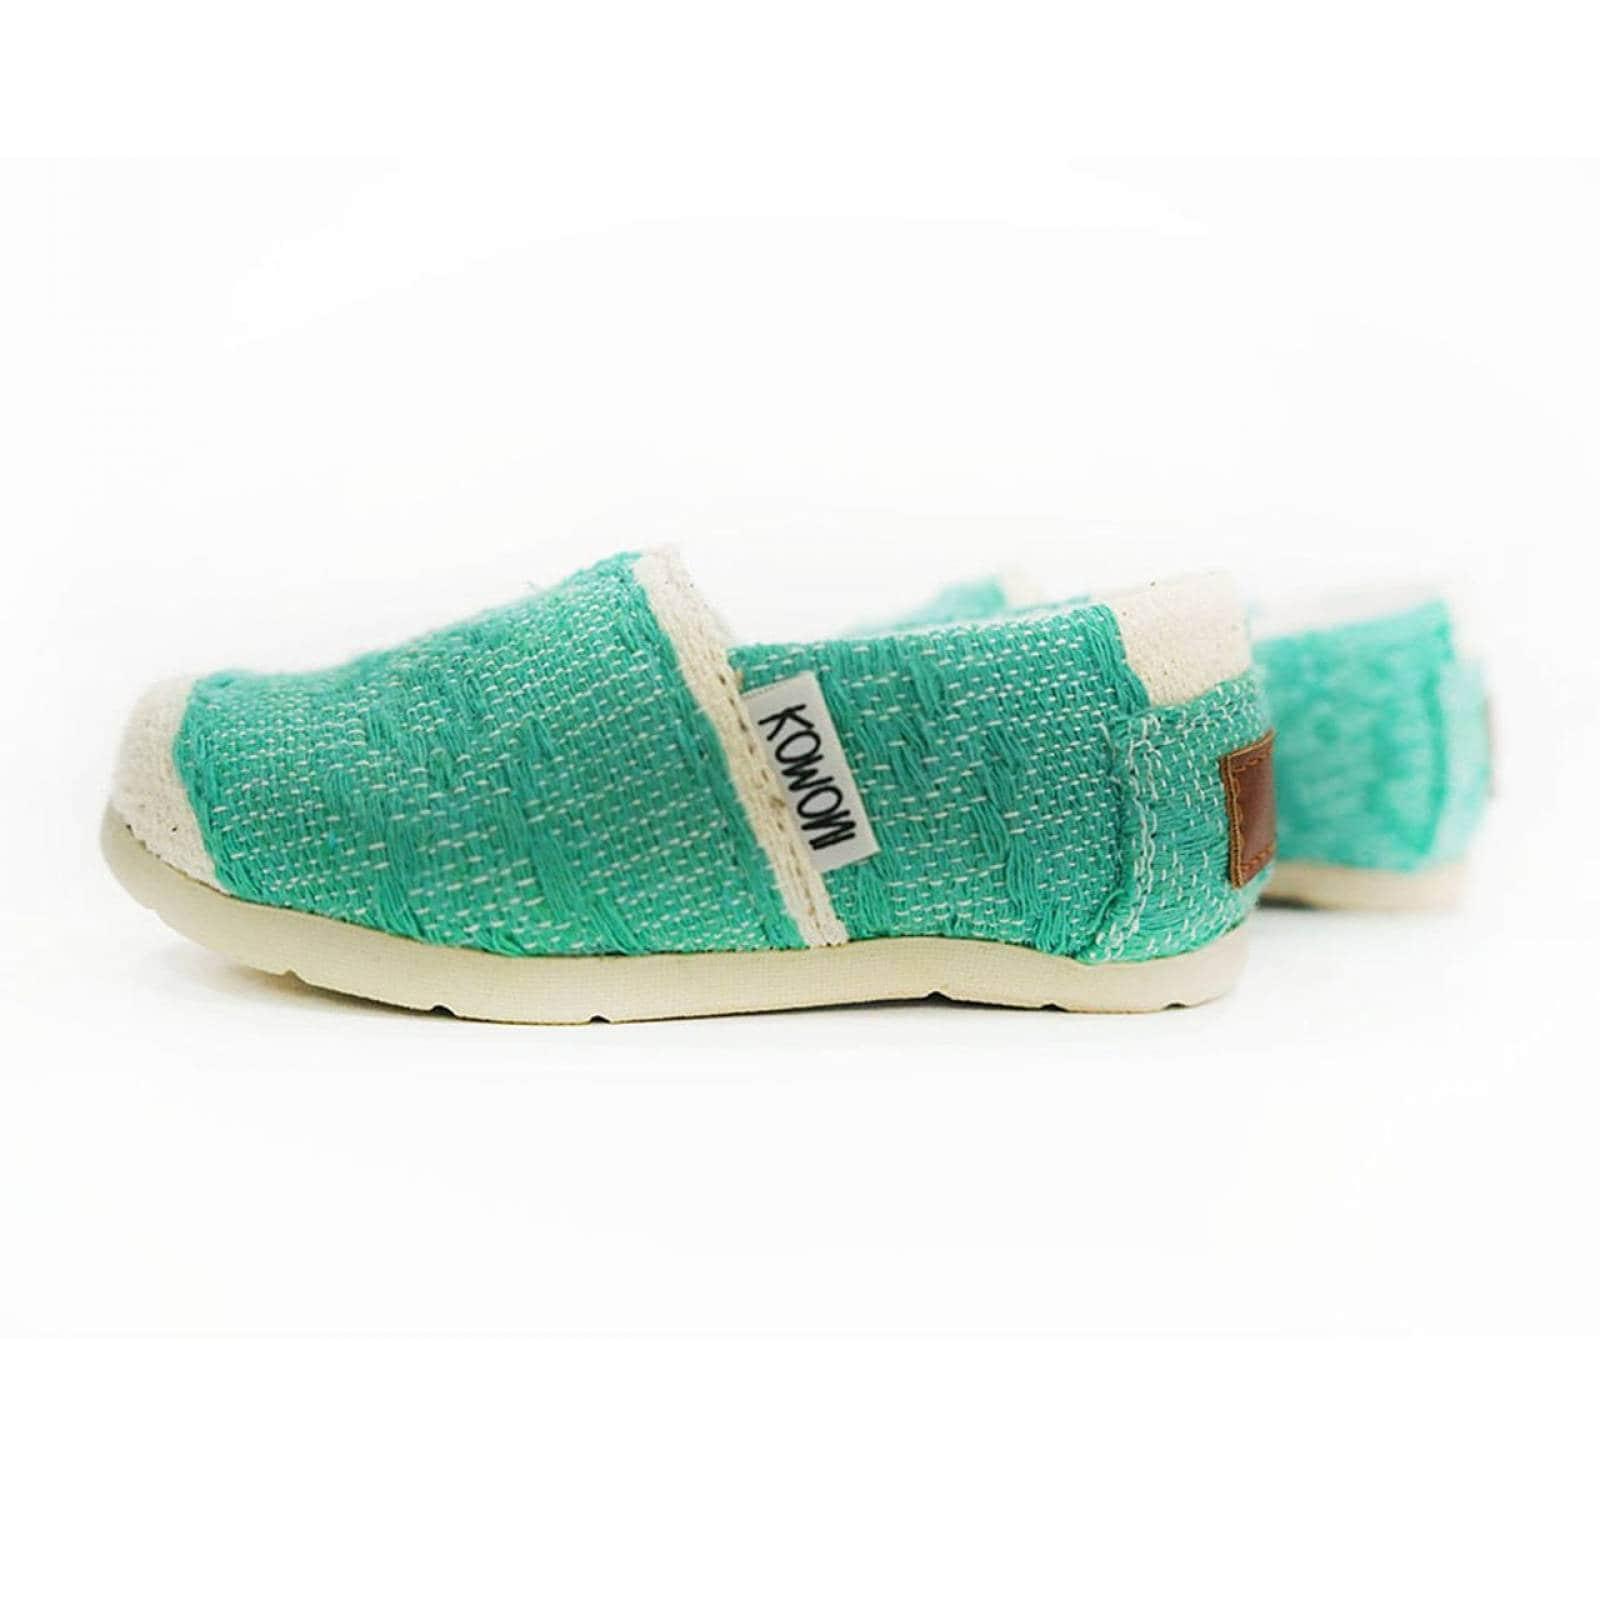 Zapato Alpargata Mini Jacinta Artesanal Tela Infantil Verde Komoni Talla: 16